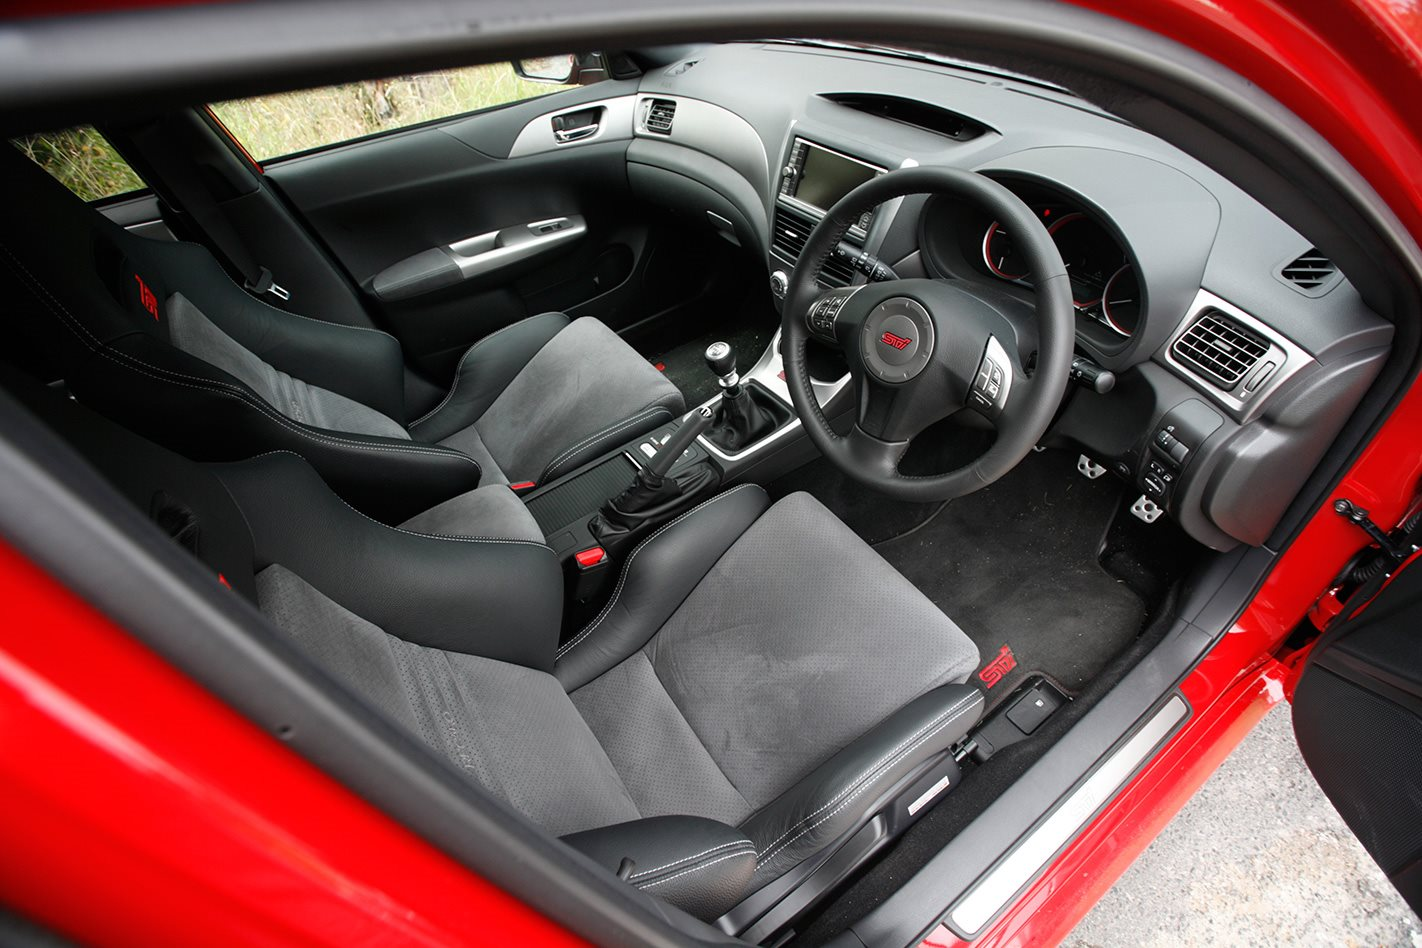 2008 Subaru Impreza WRX STI cabin.jpg